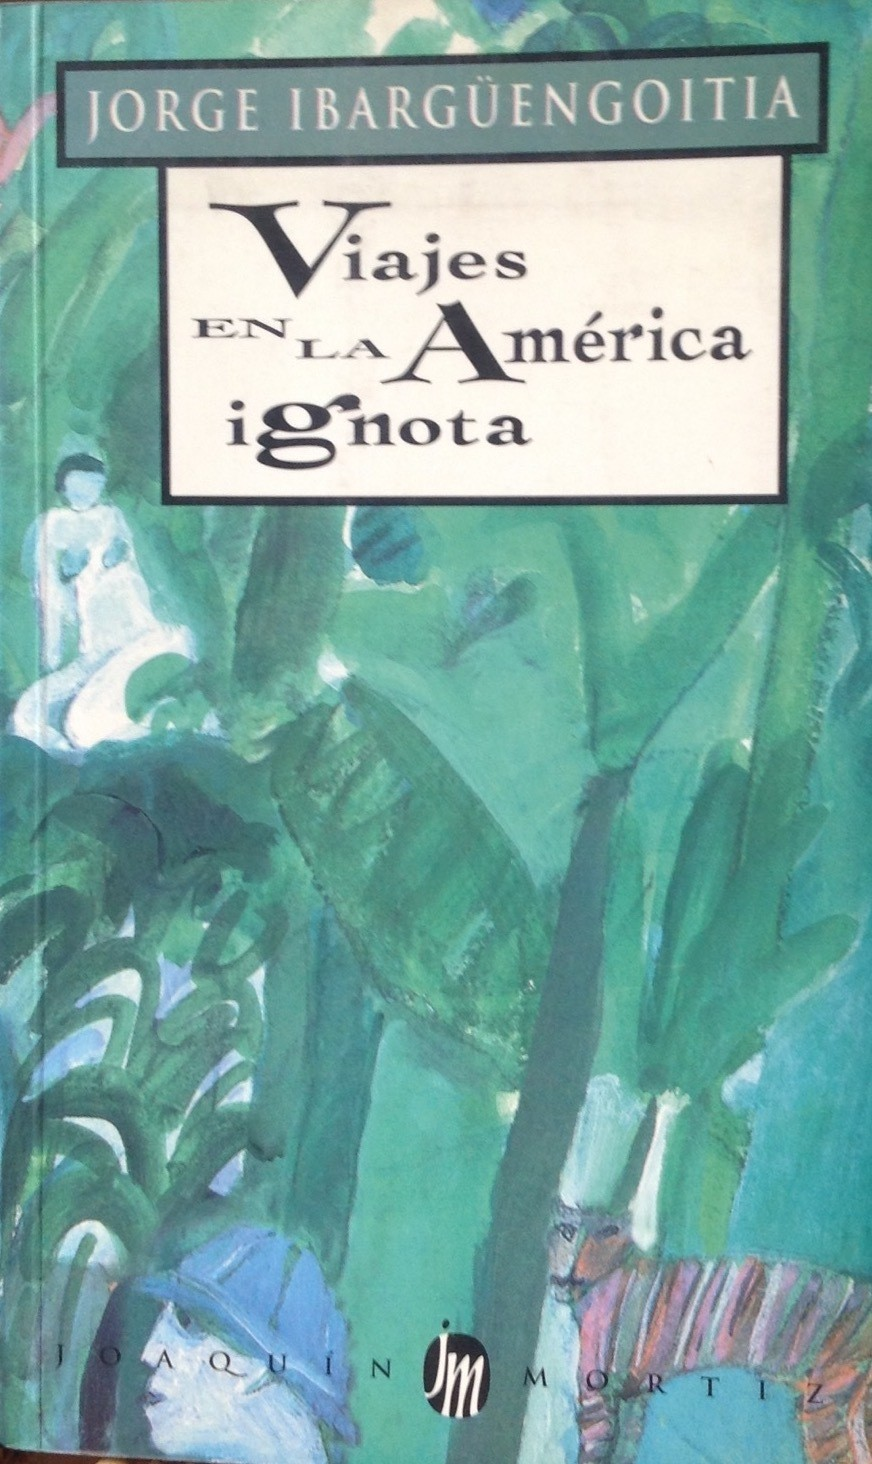 Jorge Ibargüengoitia, Viajes a la América ignota